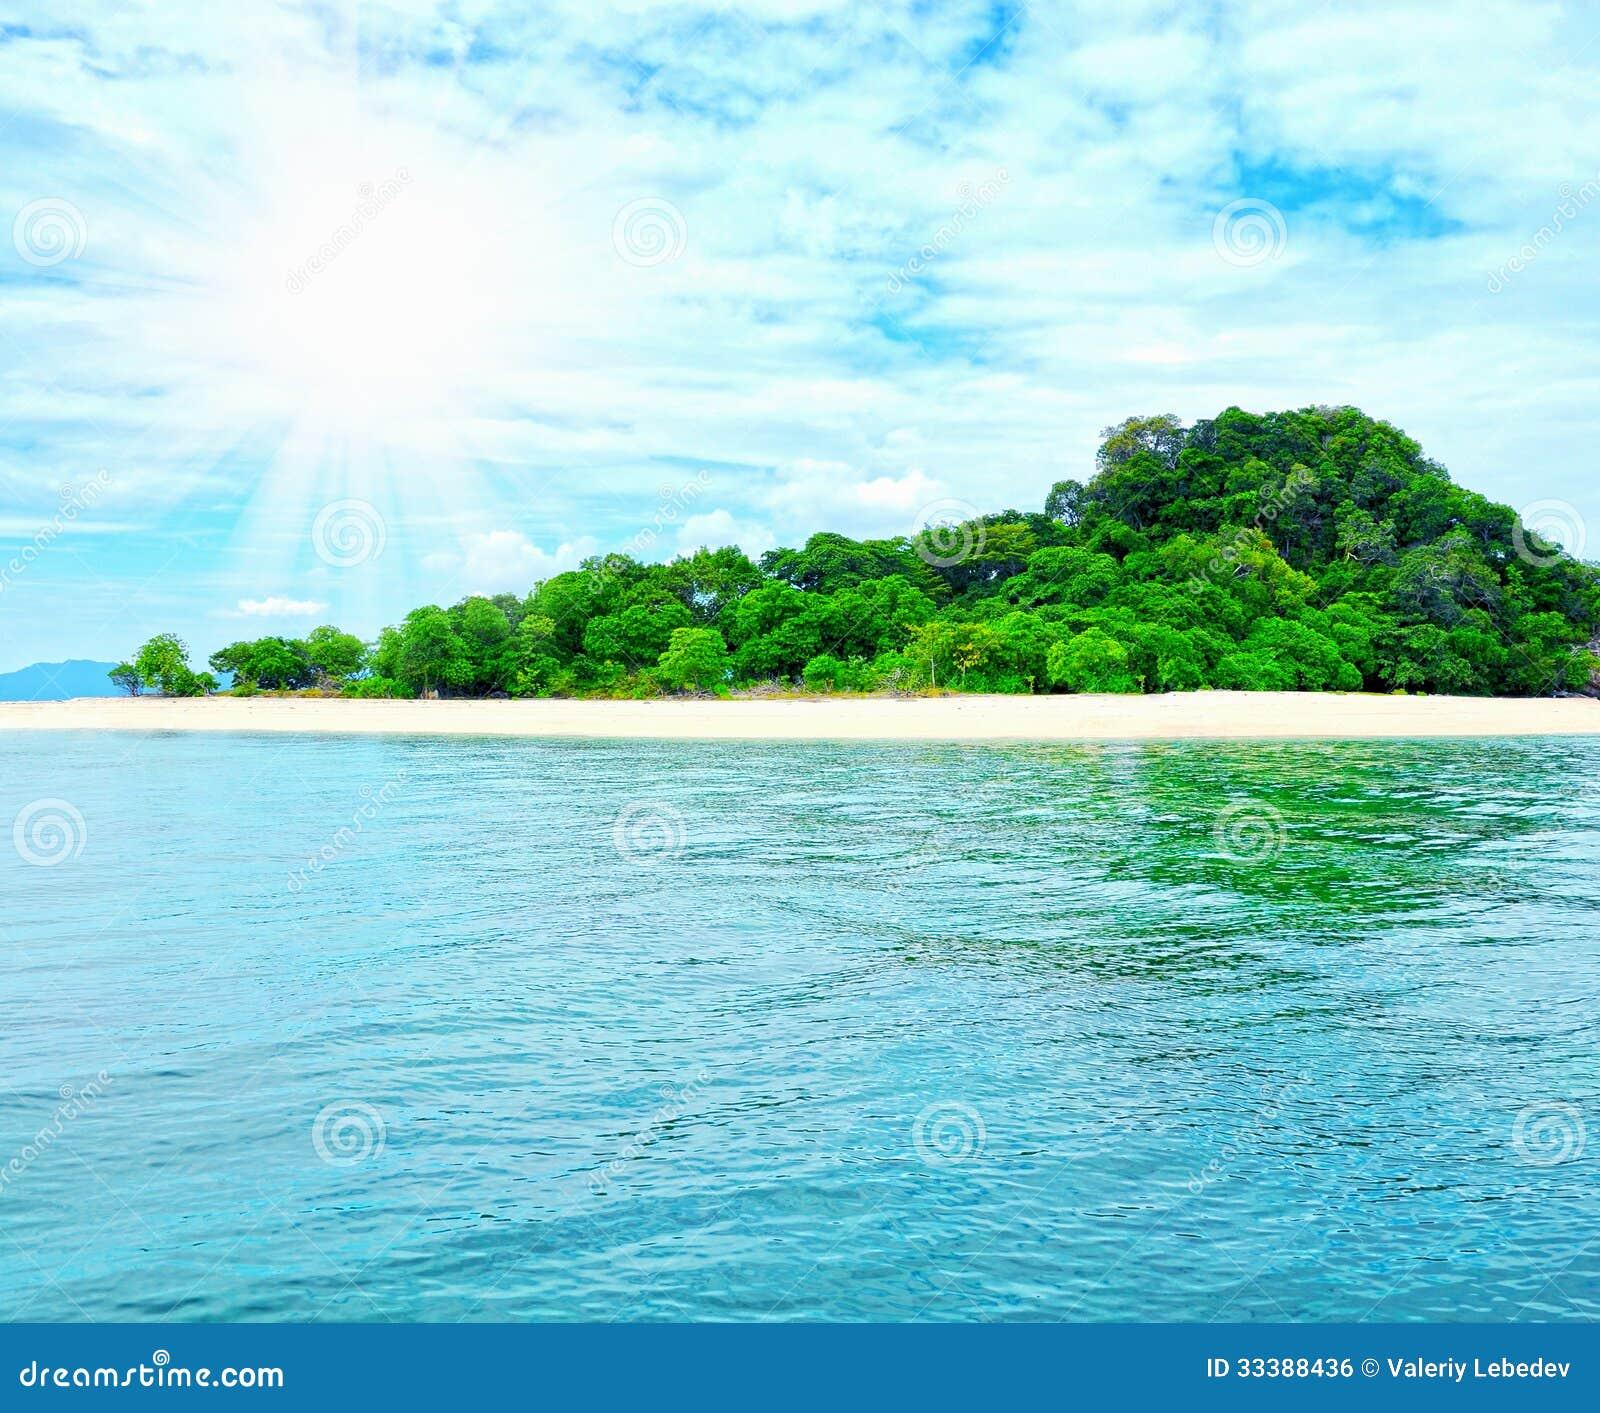 Tropical Island Beaches: Sunny Tropical Beach On The Island Royalty Free Stock